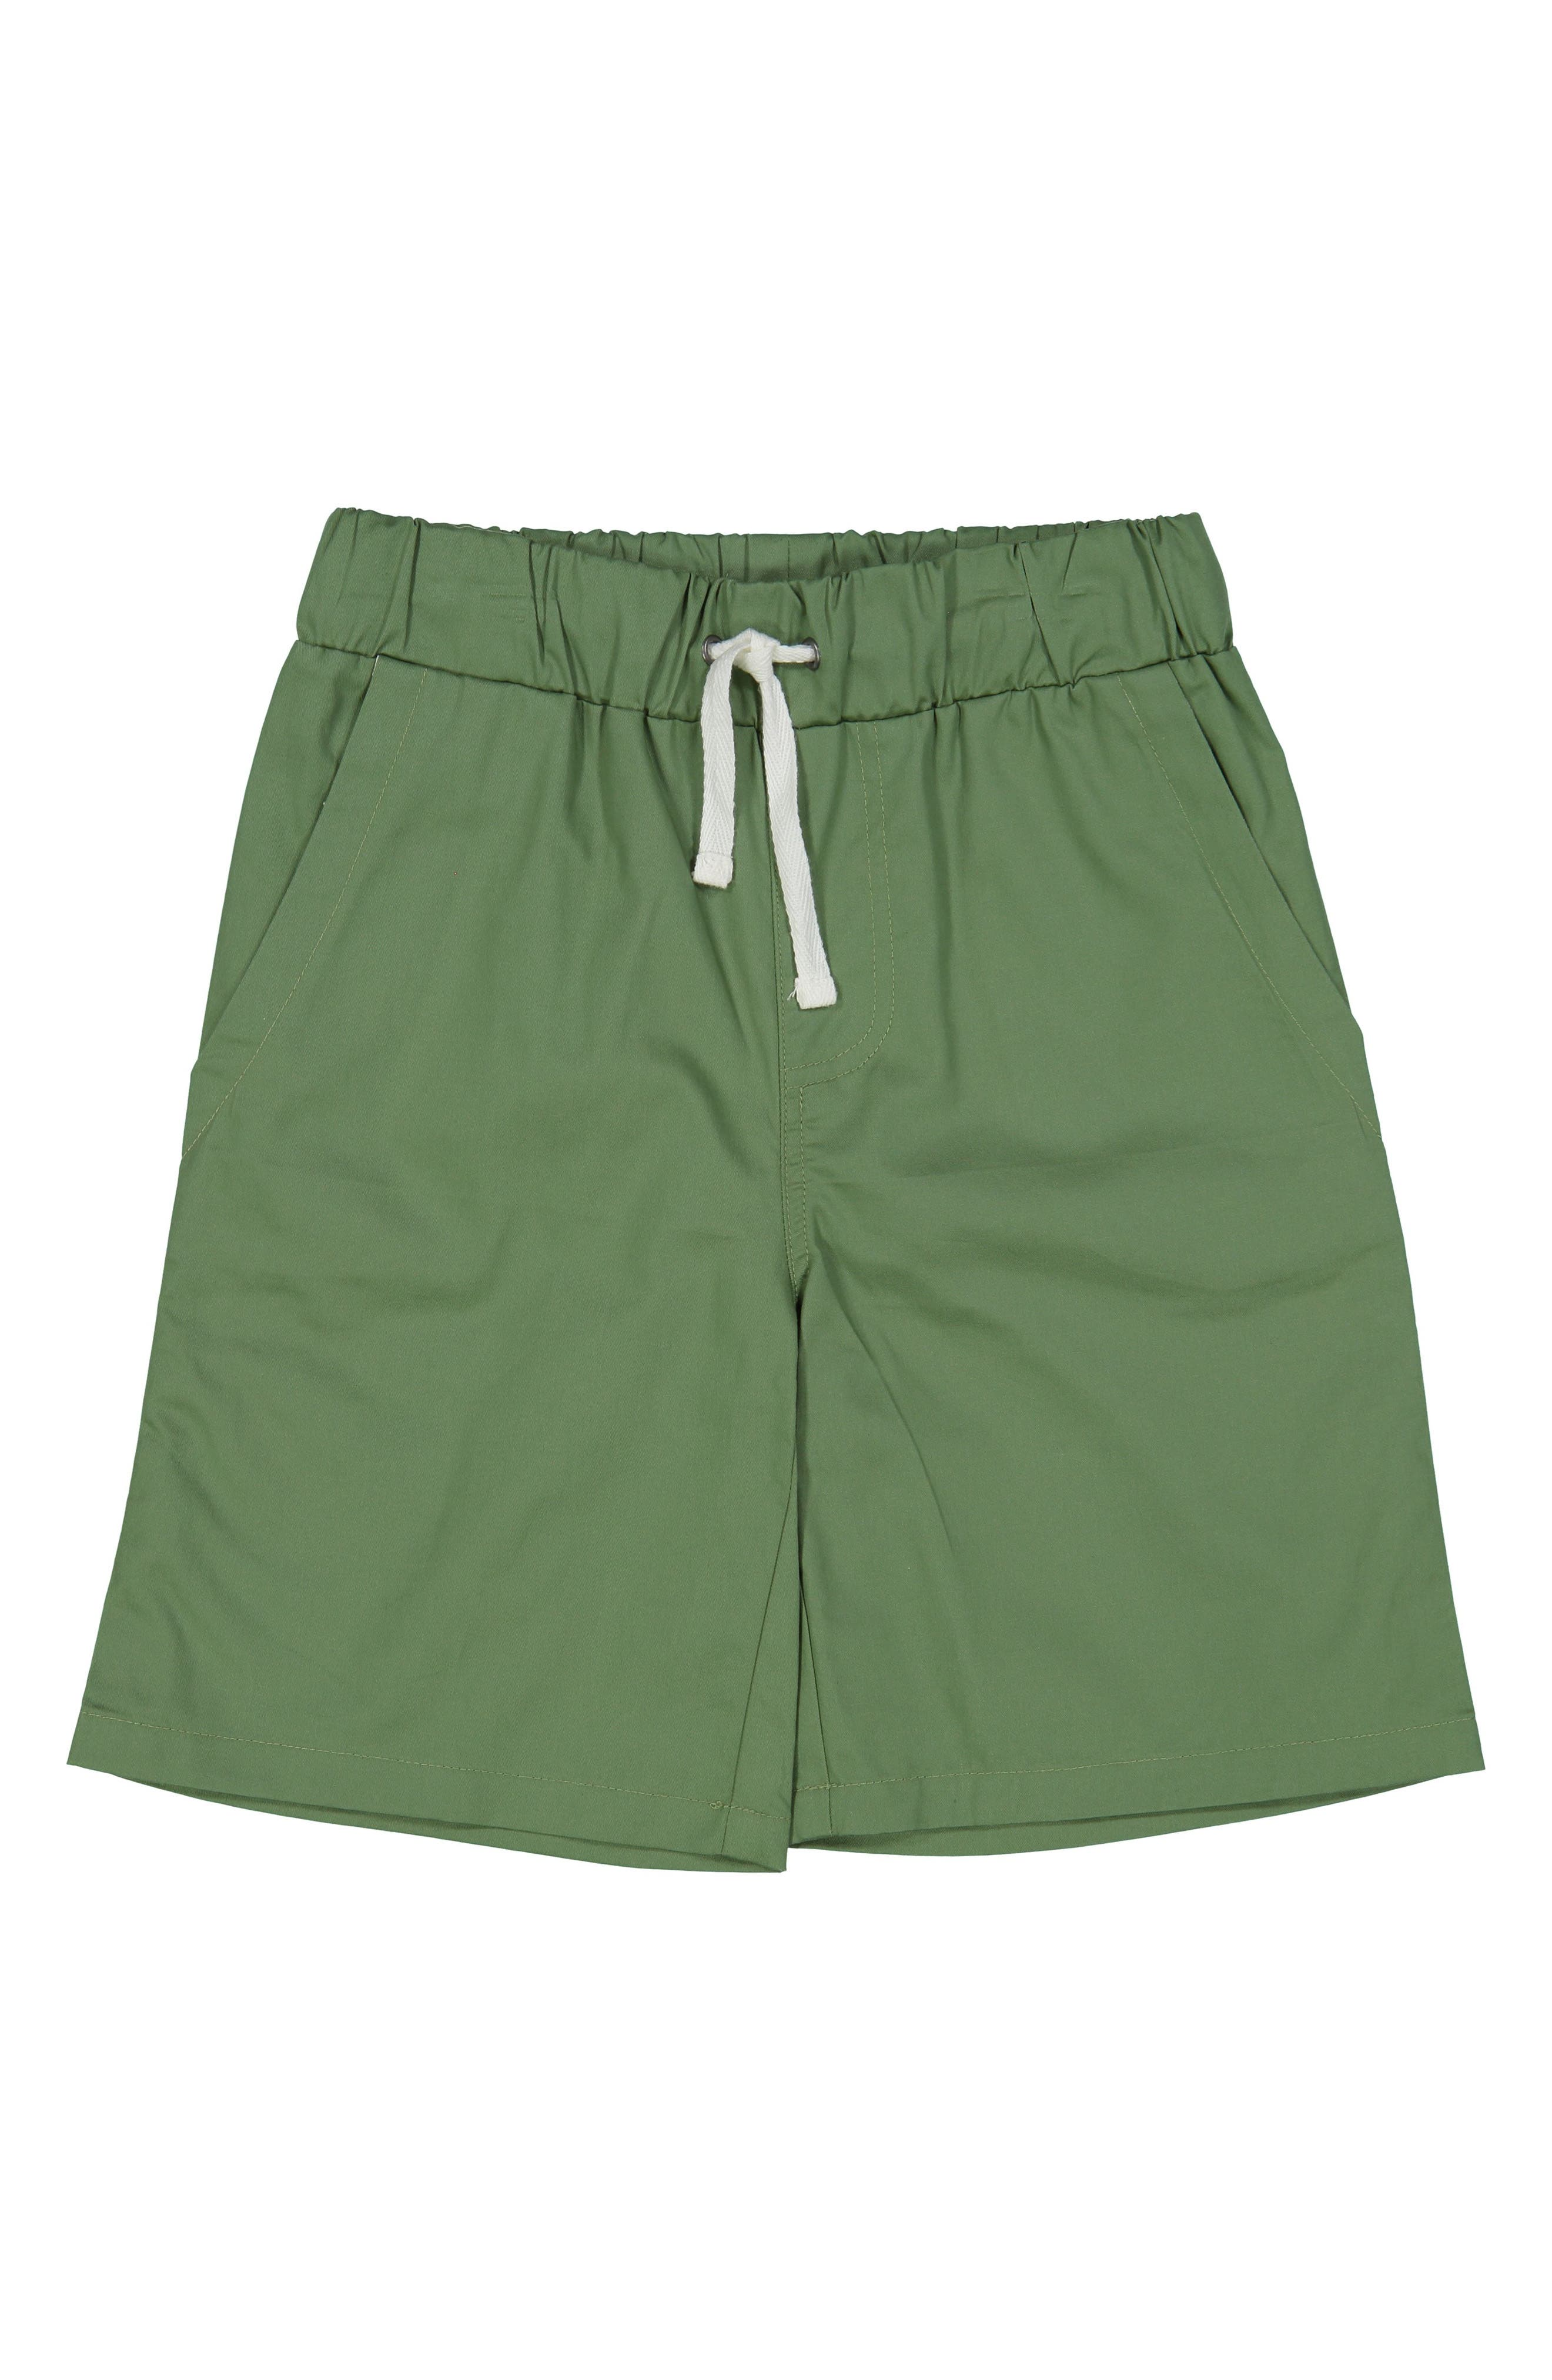 Moss Pull-On Shorts,                             Main thumbnail 1, color,                             Green